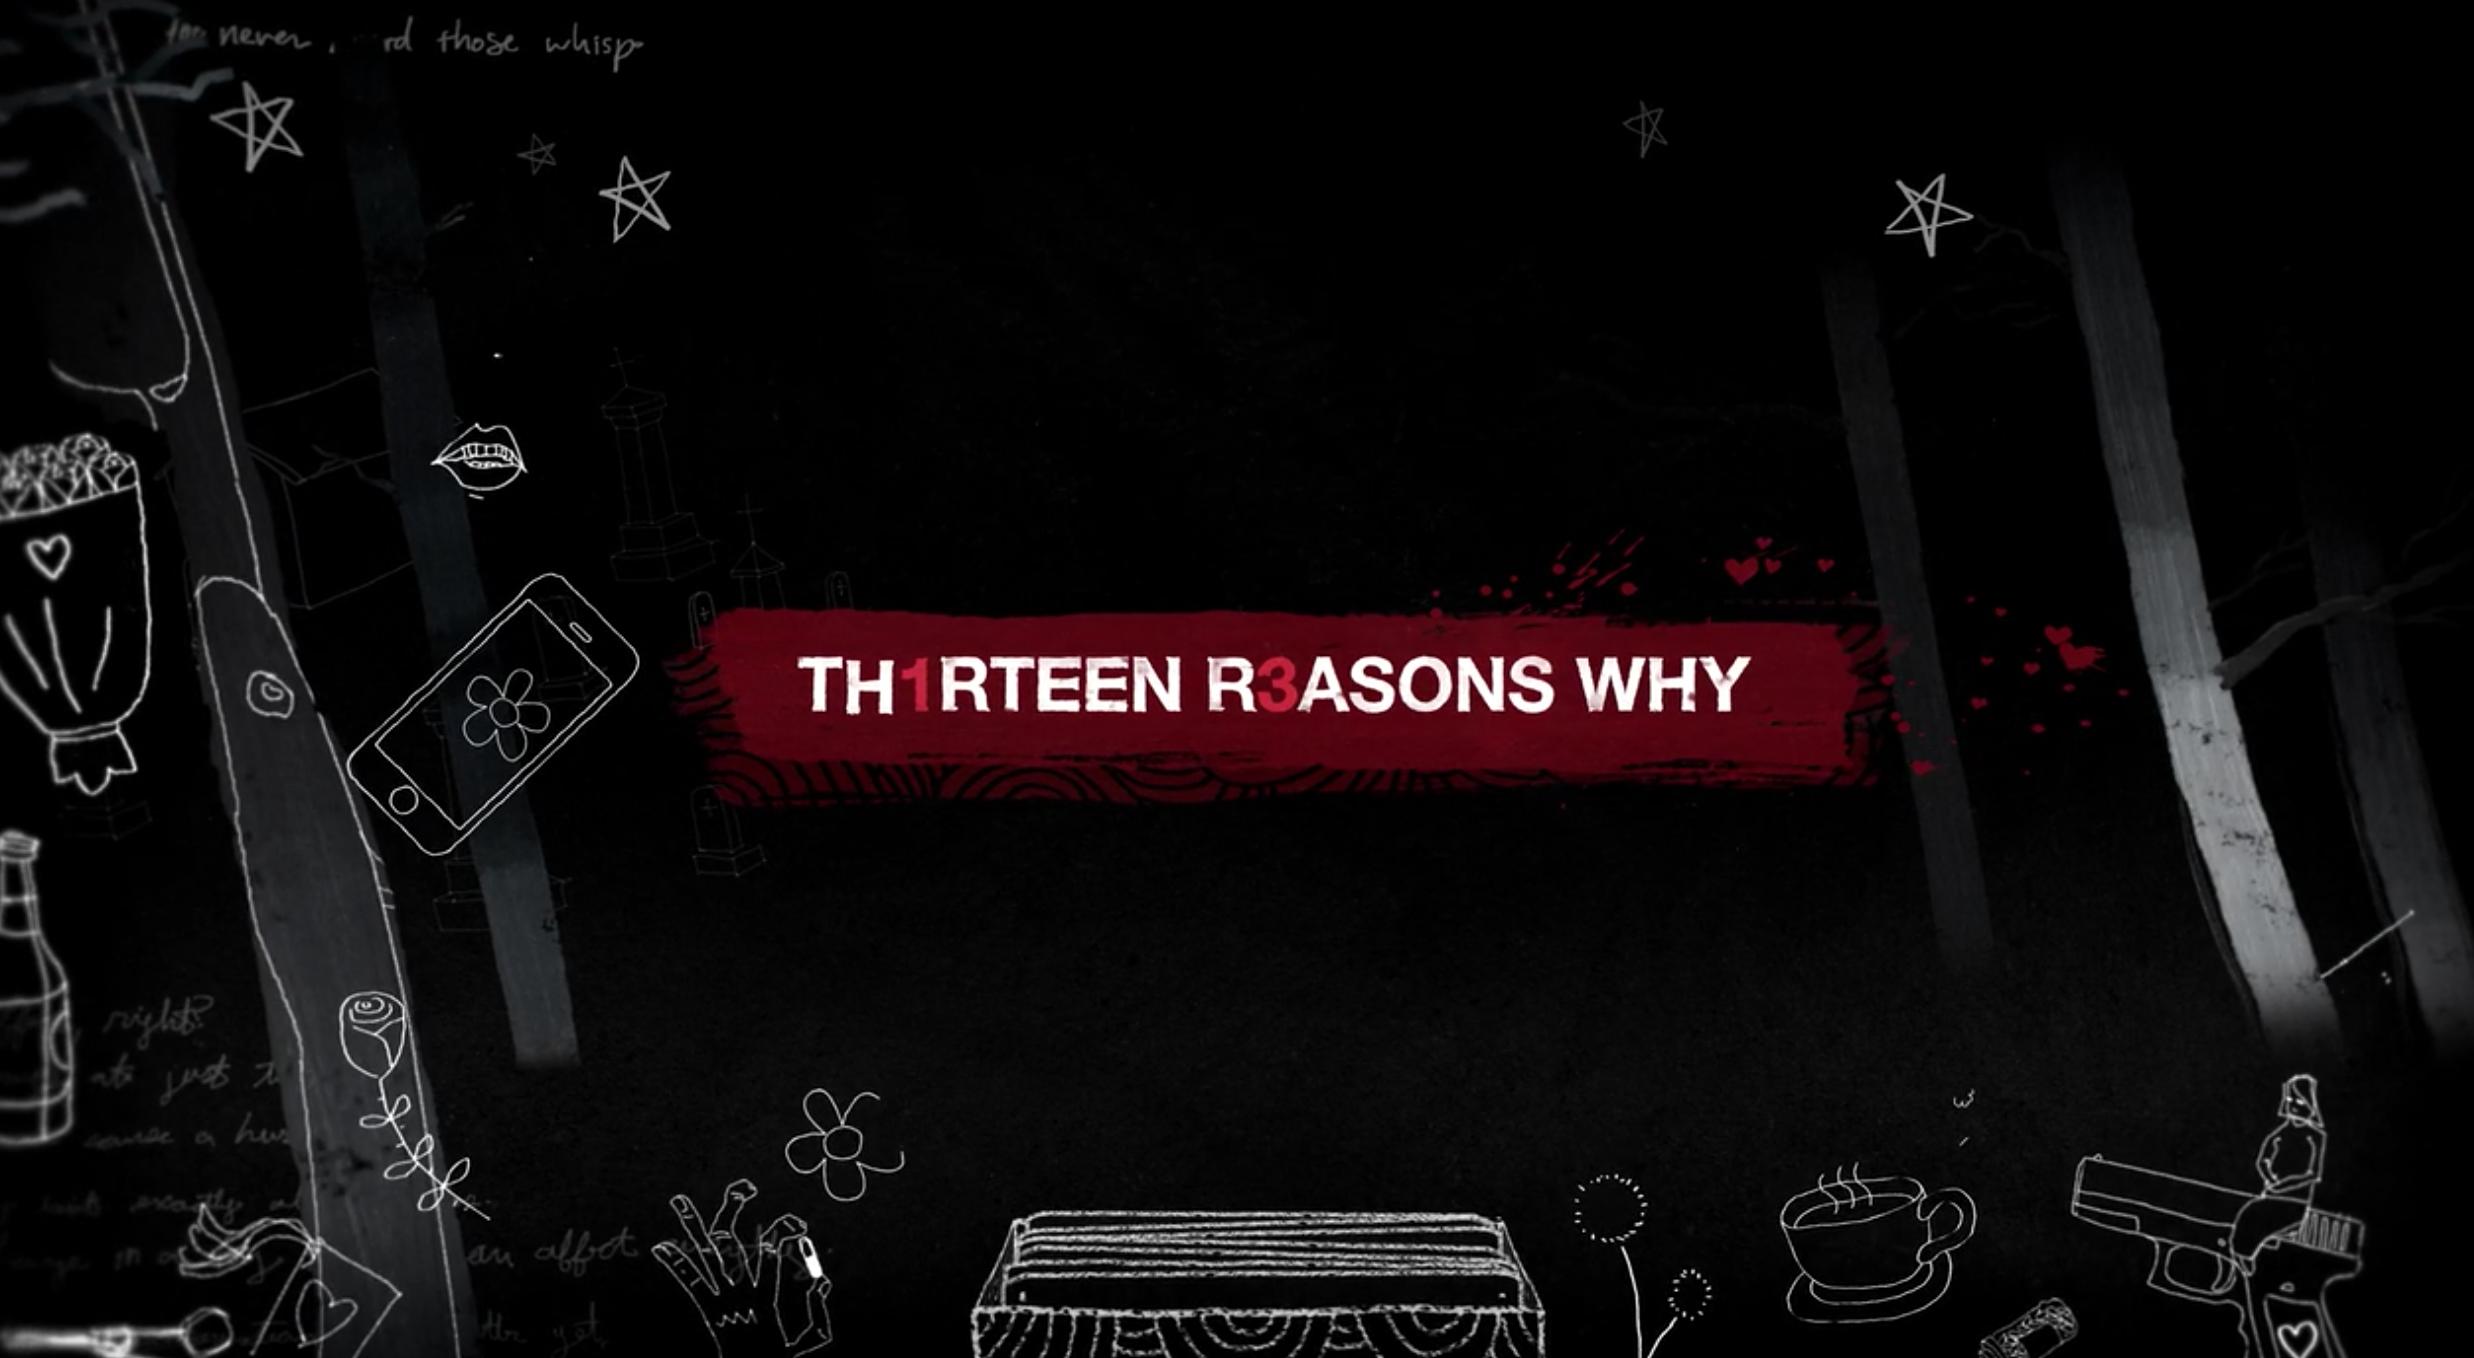 13 Reasons Why (film)